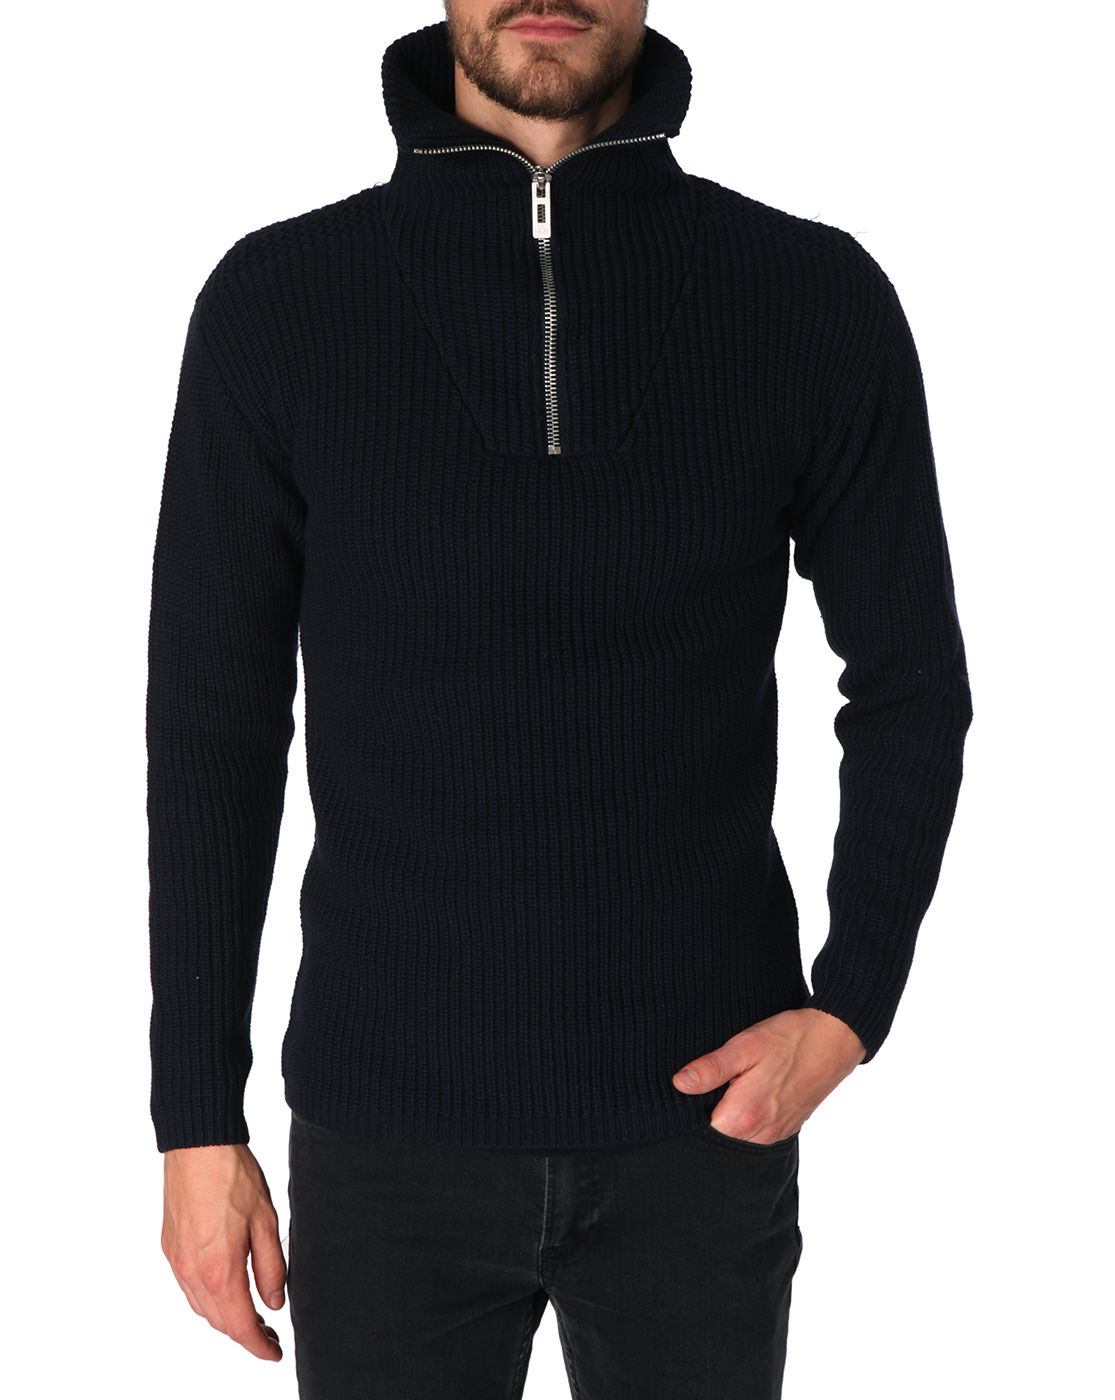 g star raw bribcort navy zip sweater with trucker collar. Black Bedroom Furniture Sets. Home Design Ideas